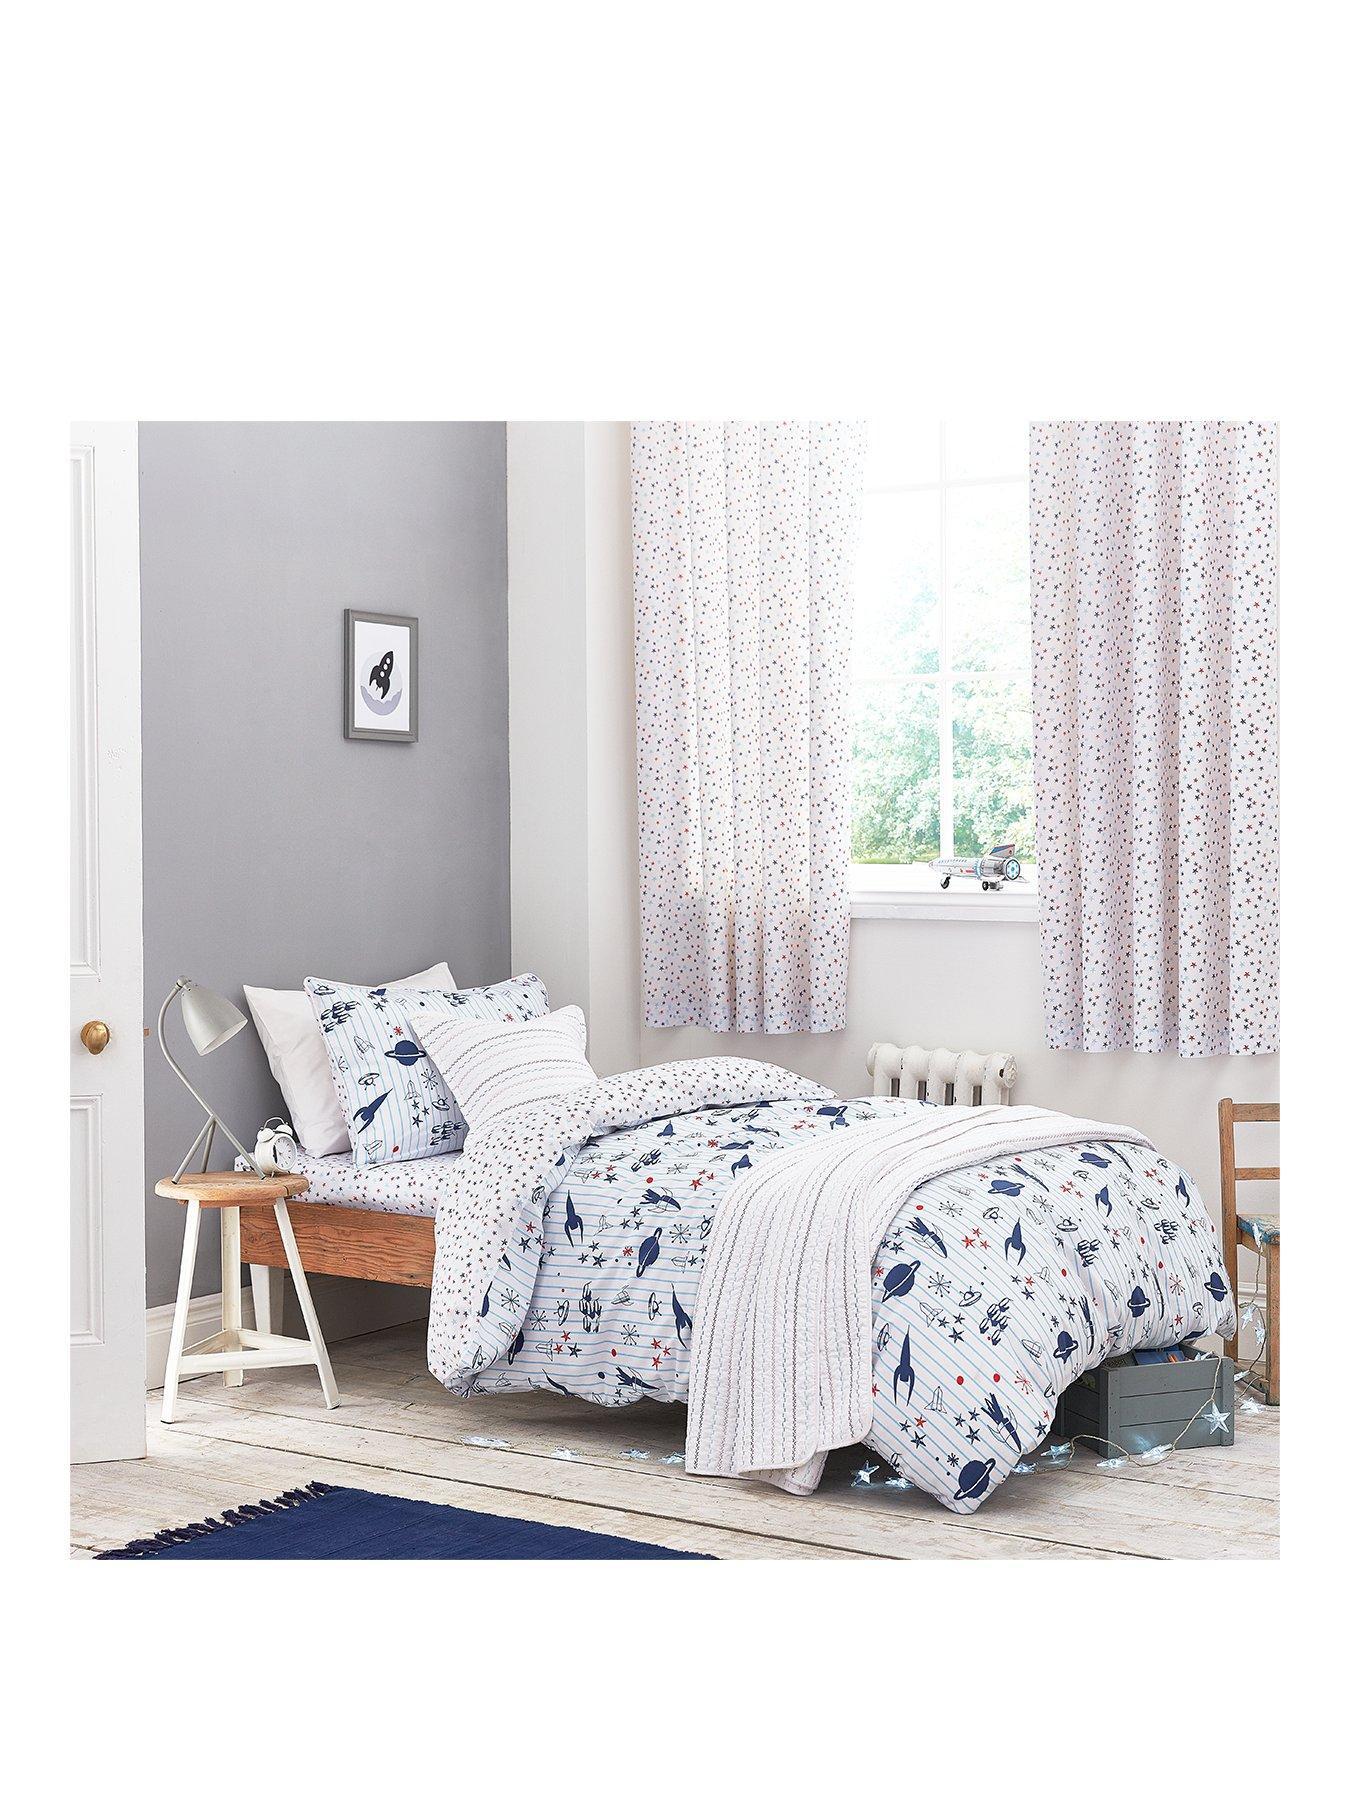 Cream White Blue Gray High Quality Bianca 100% Cotton Soft Bedspread Throwover Bedding